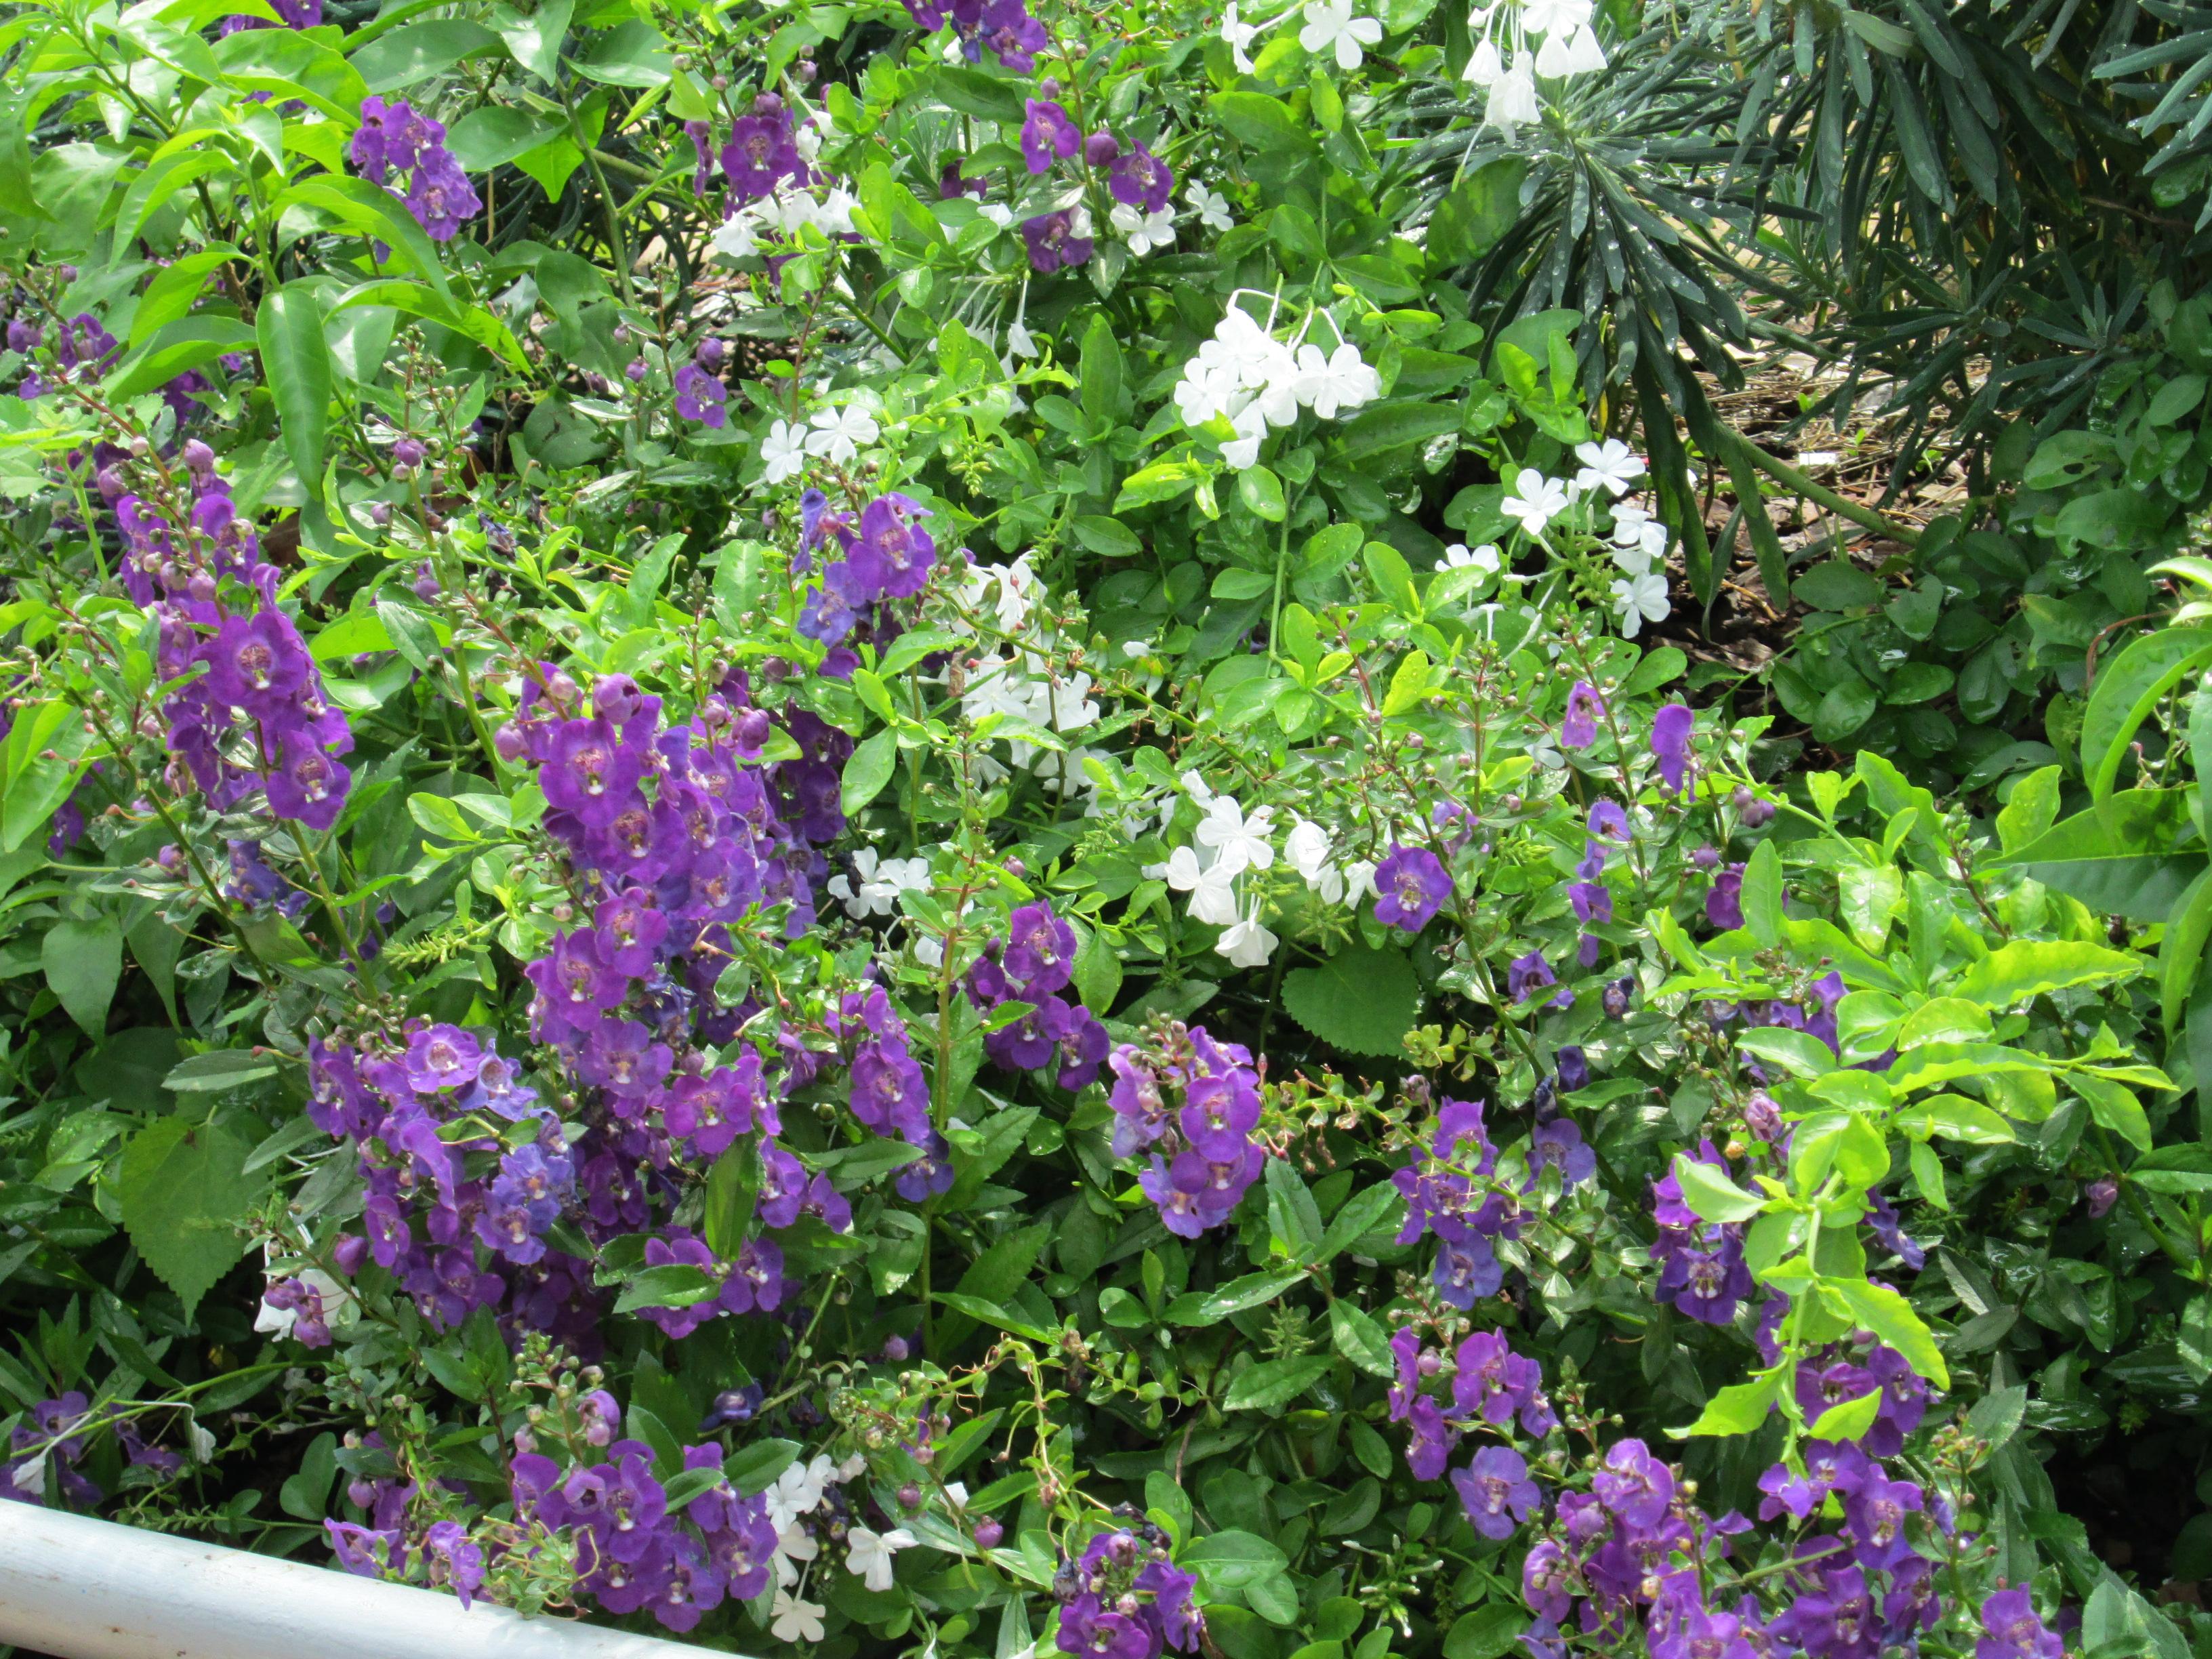 Filepurple Flowering Plants At Fmnhg Wikimedia Commons